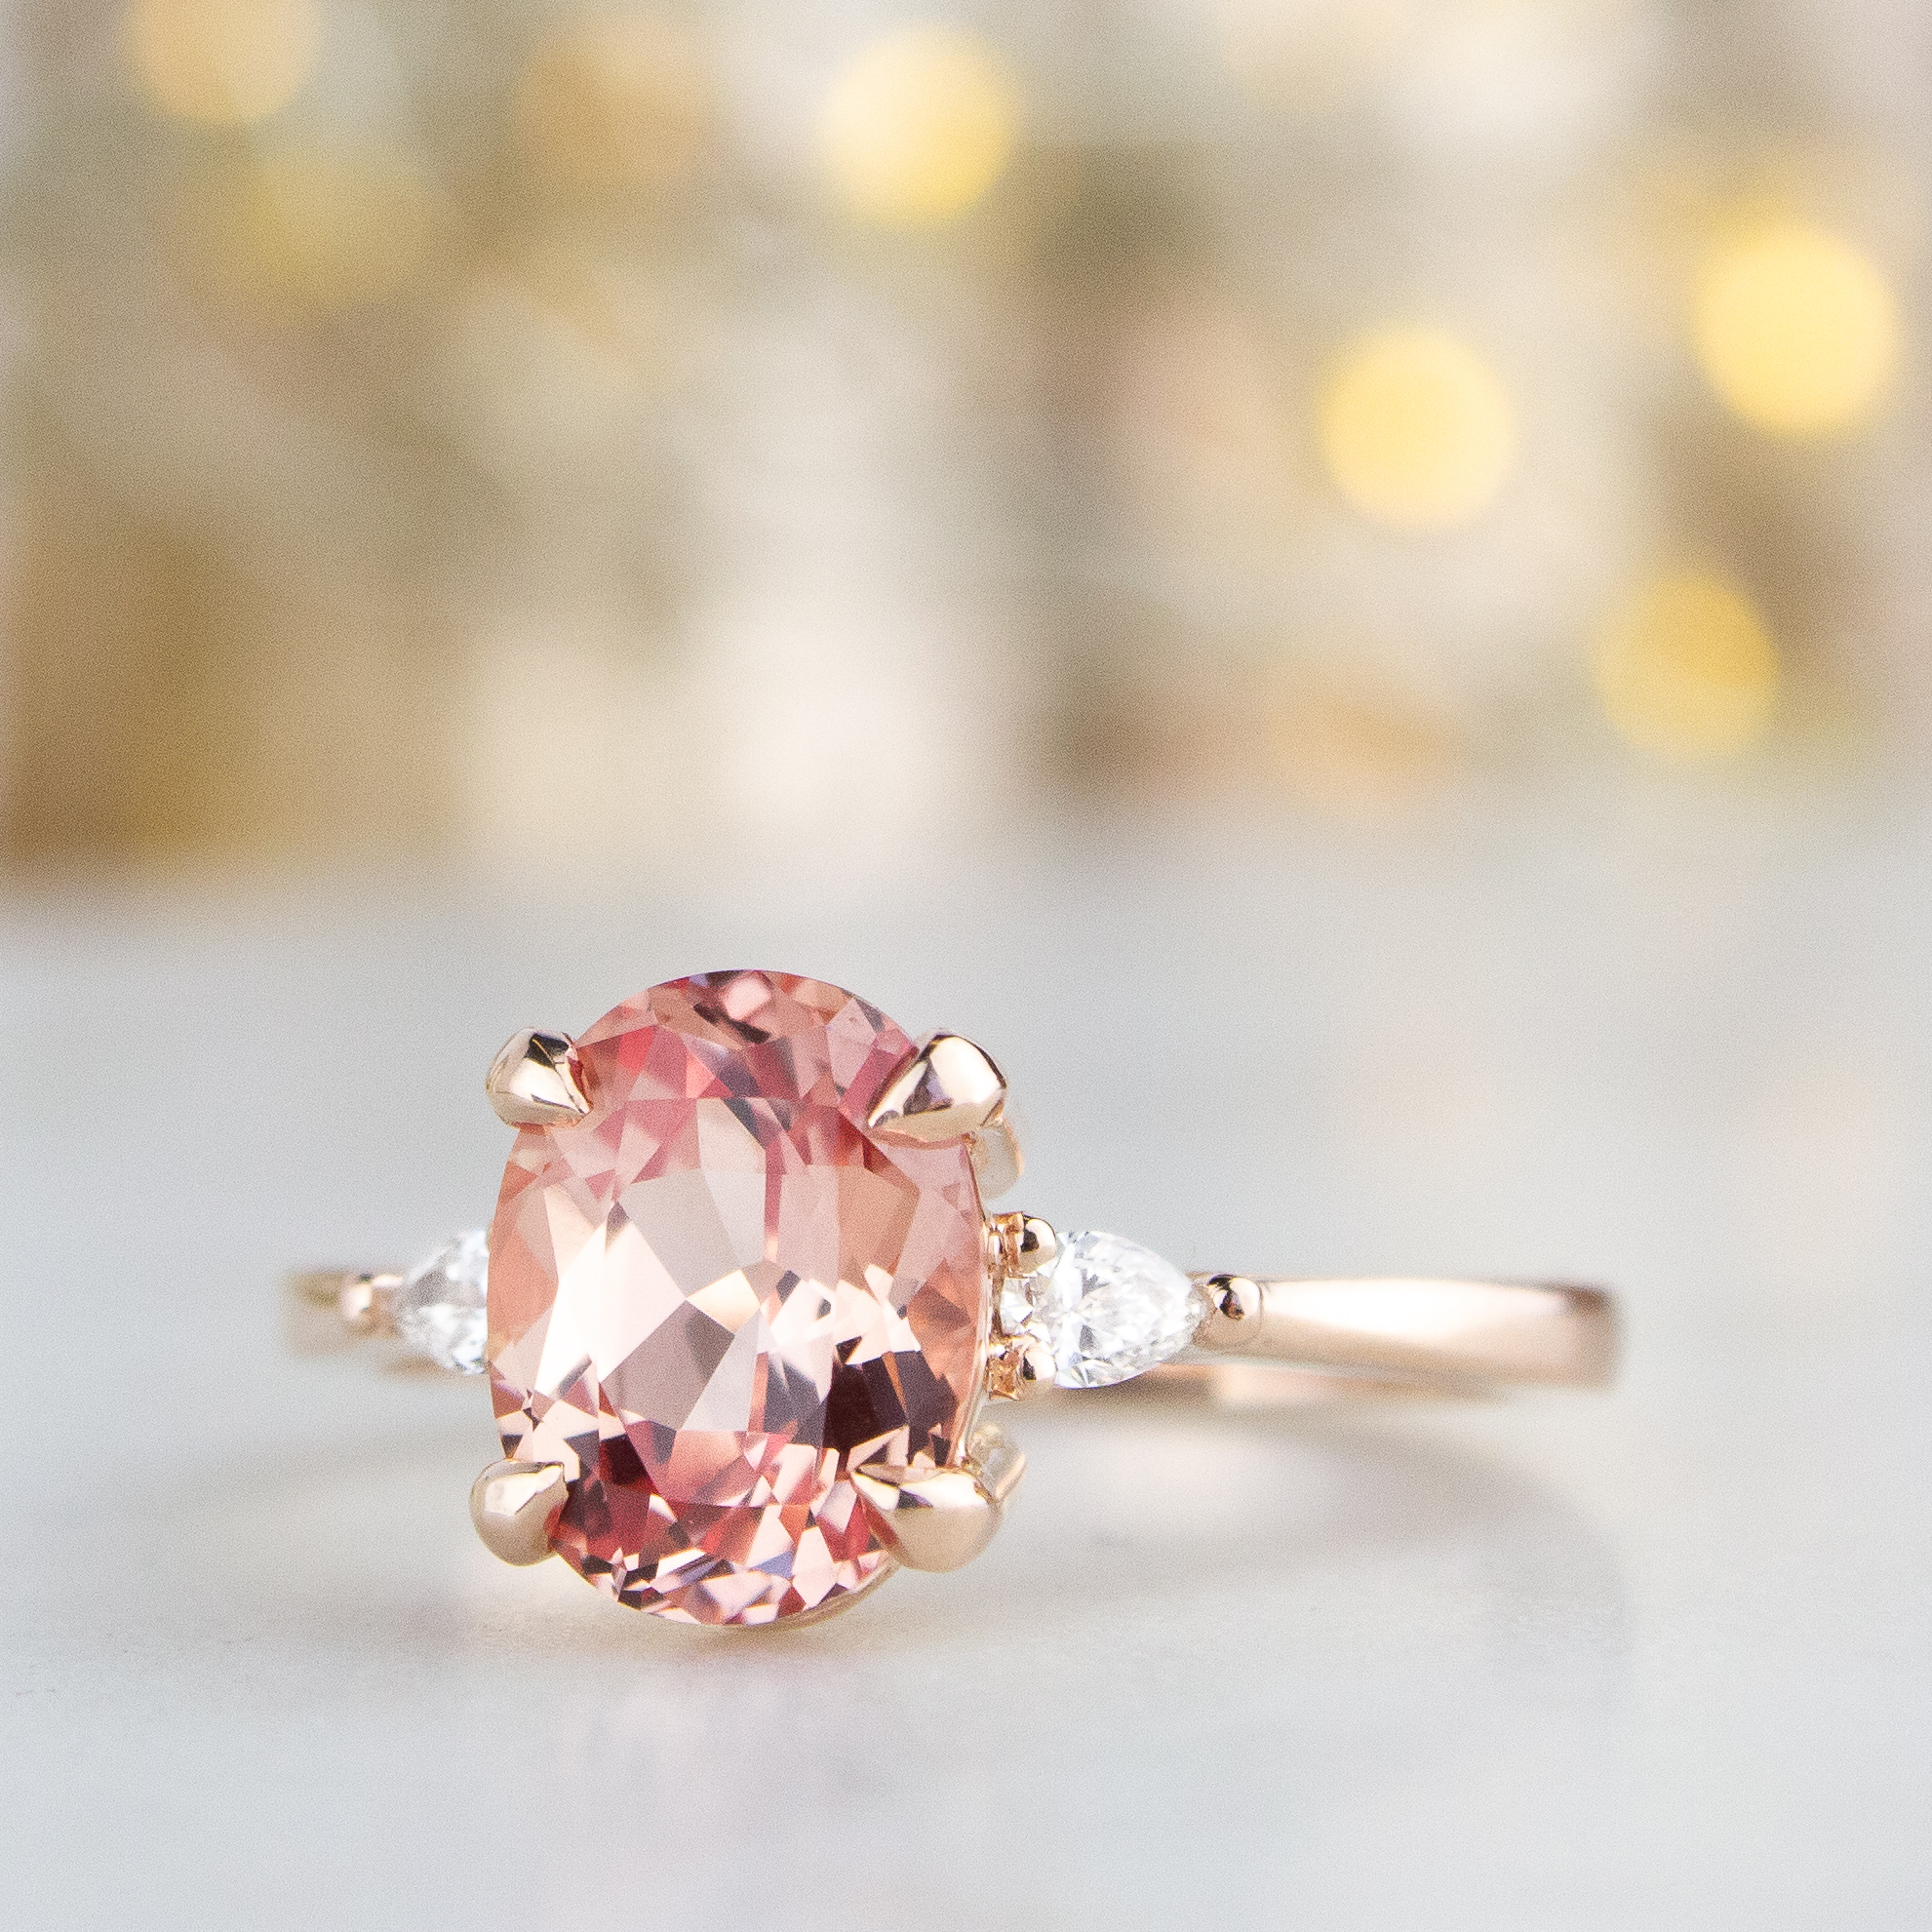 7 Stunning Diamond Alternatives Brilliant Earth Blog